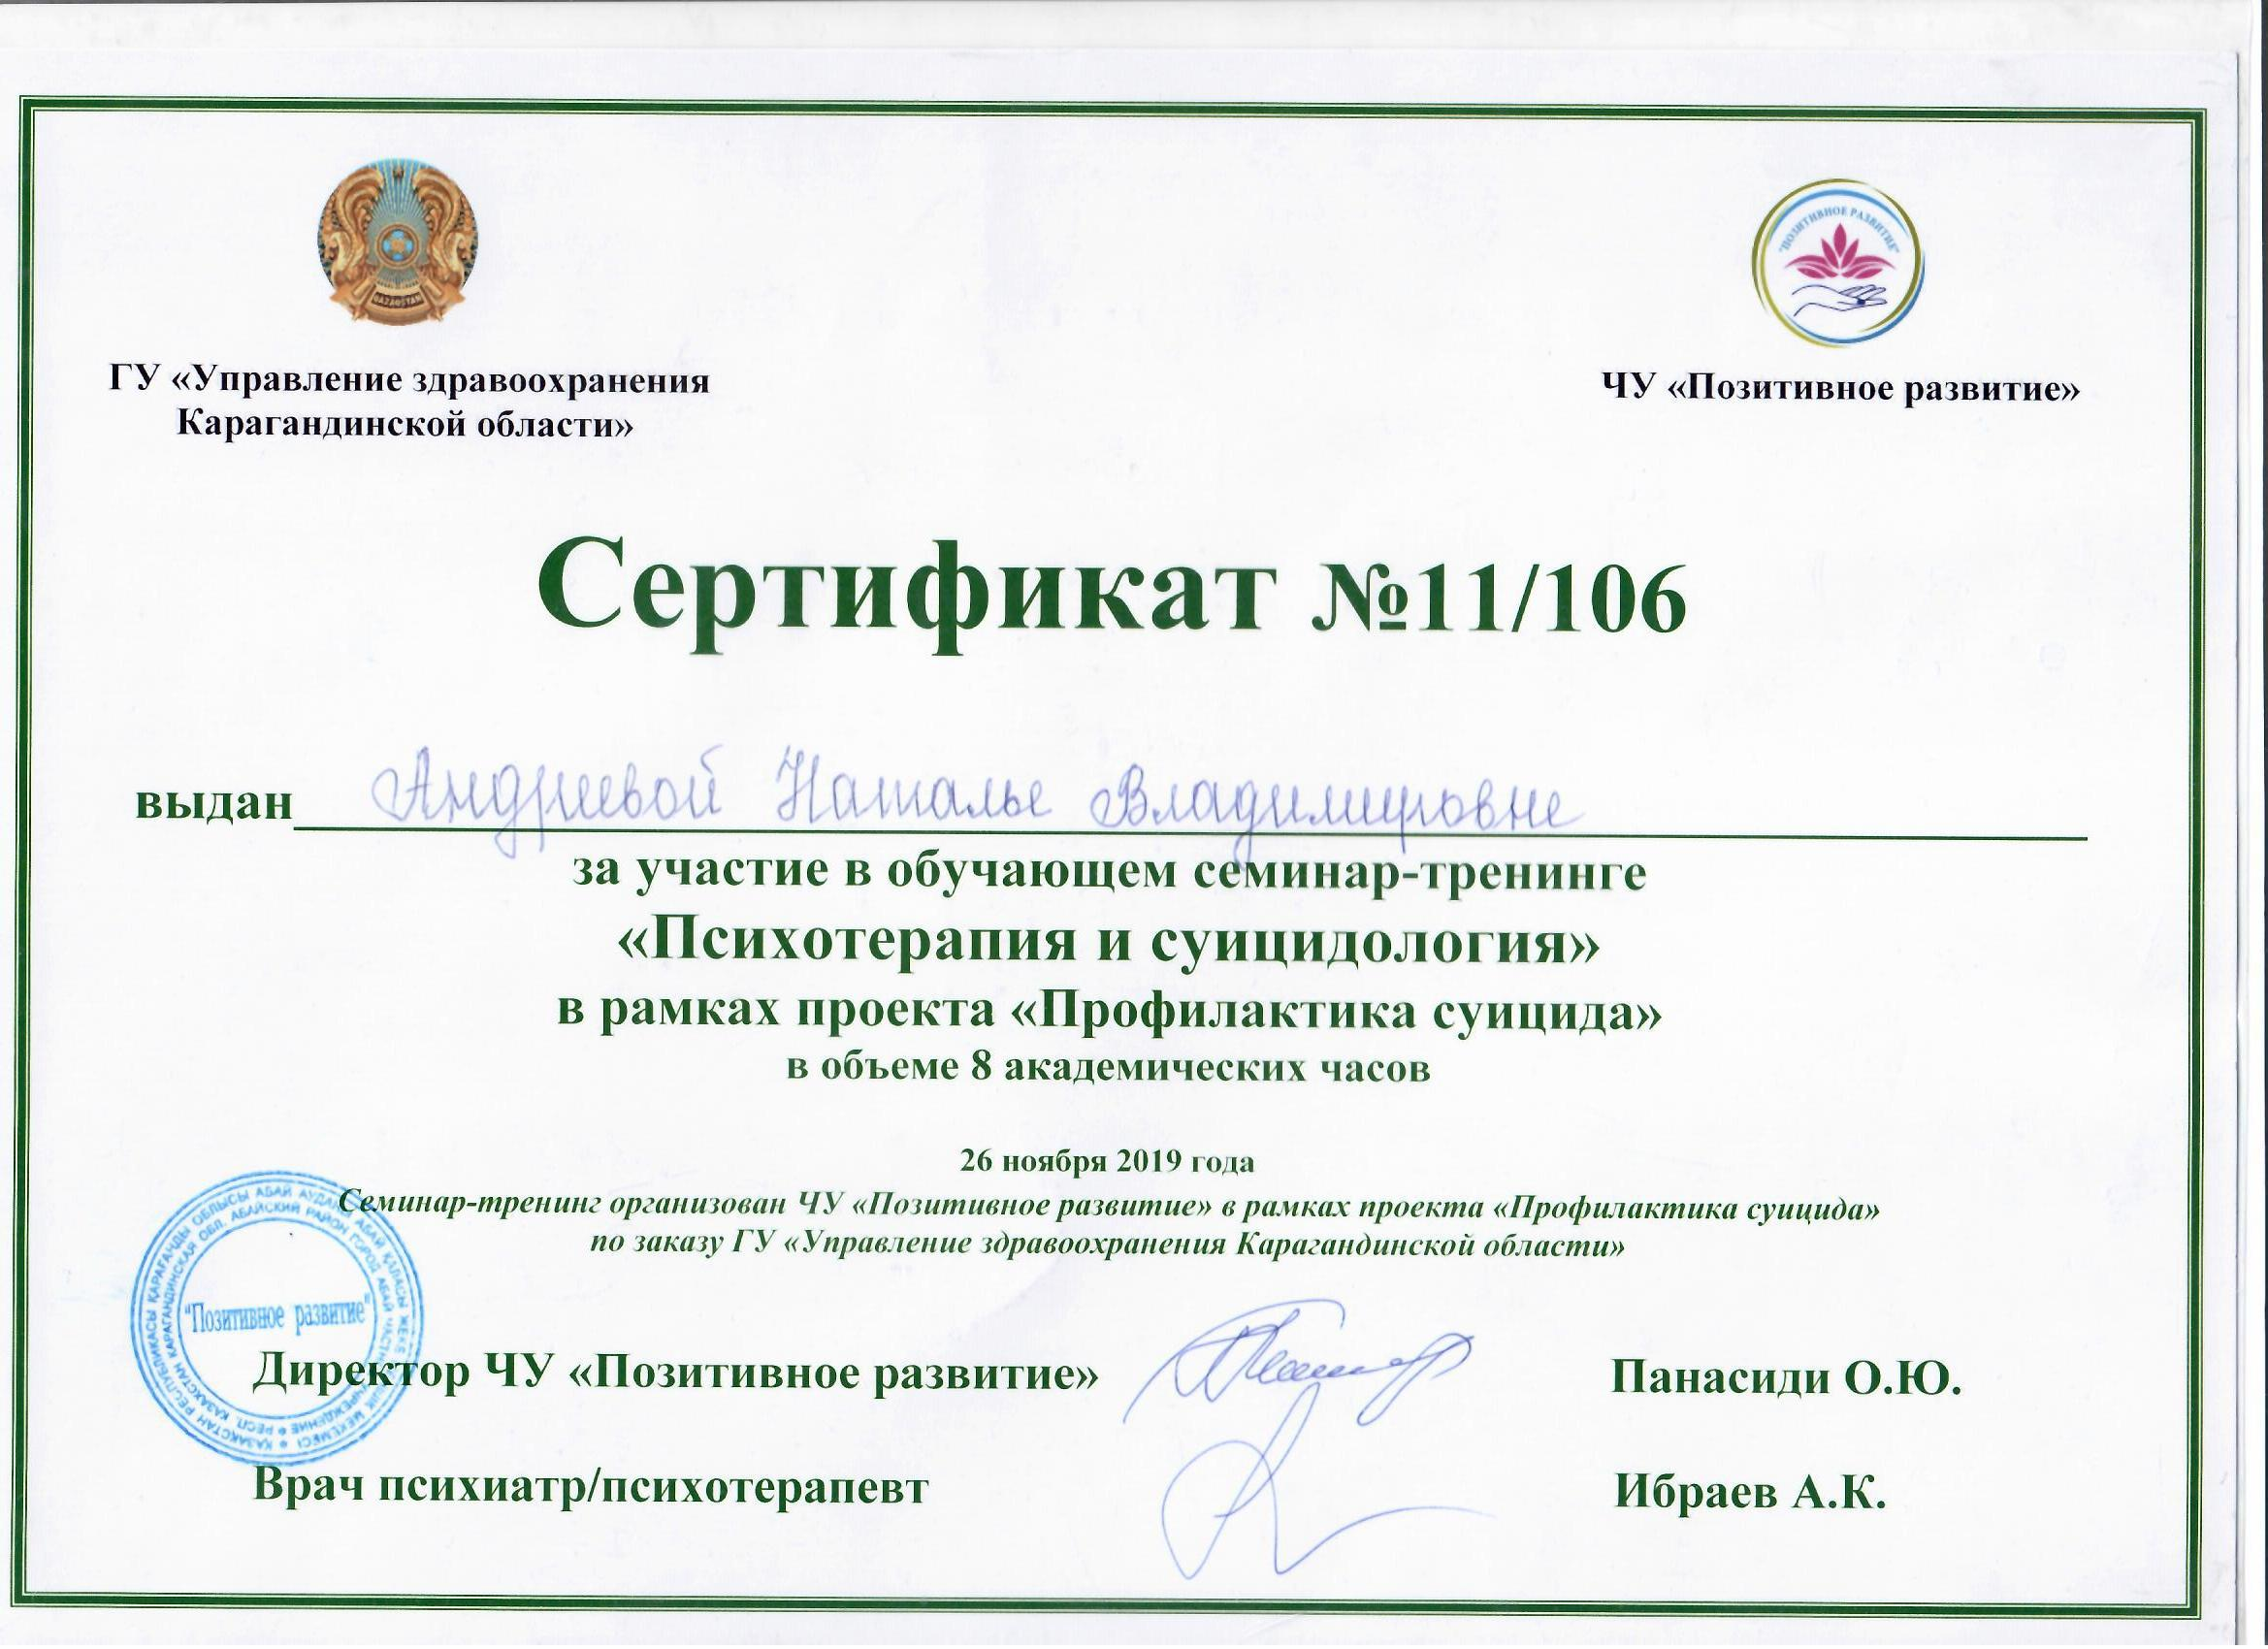 Сертификат УЗКО психолога-консультанта Натальи Андреевой